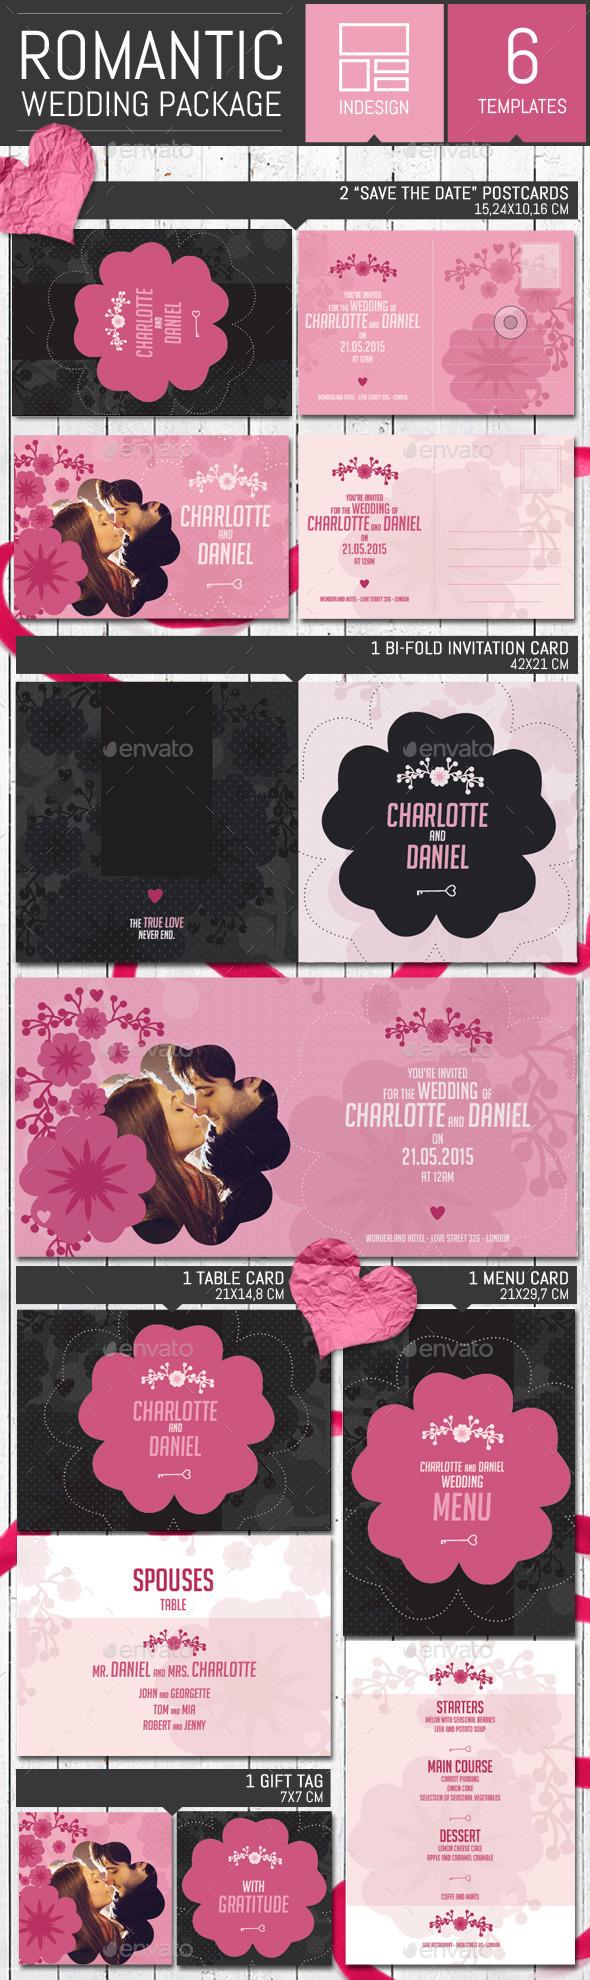 Romantic Wedding Invitation Pack Template - Weddings Cards & Invites